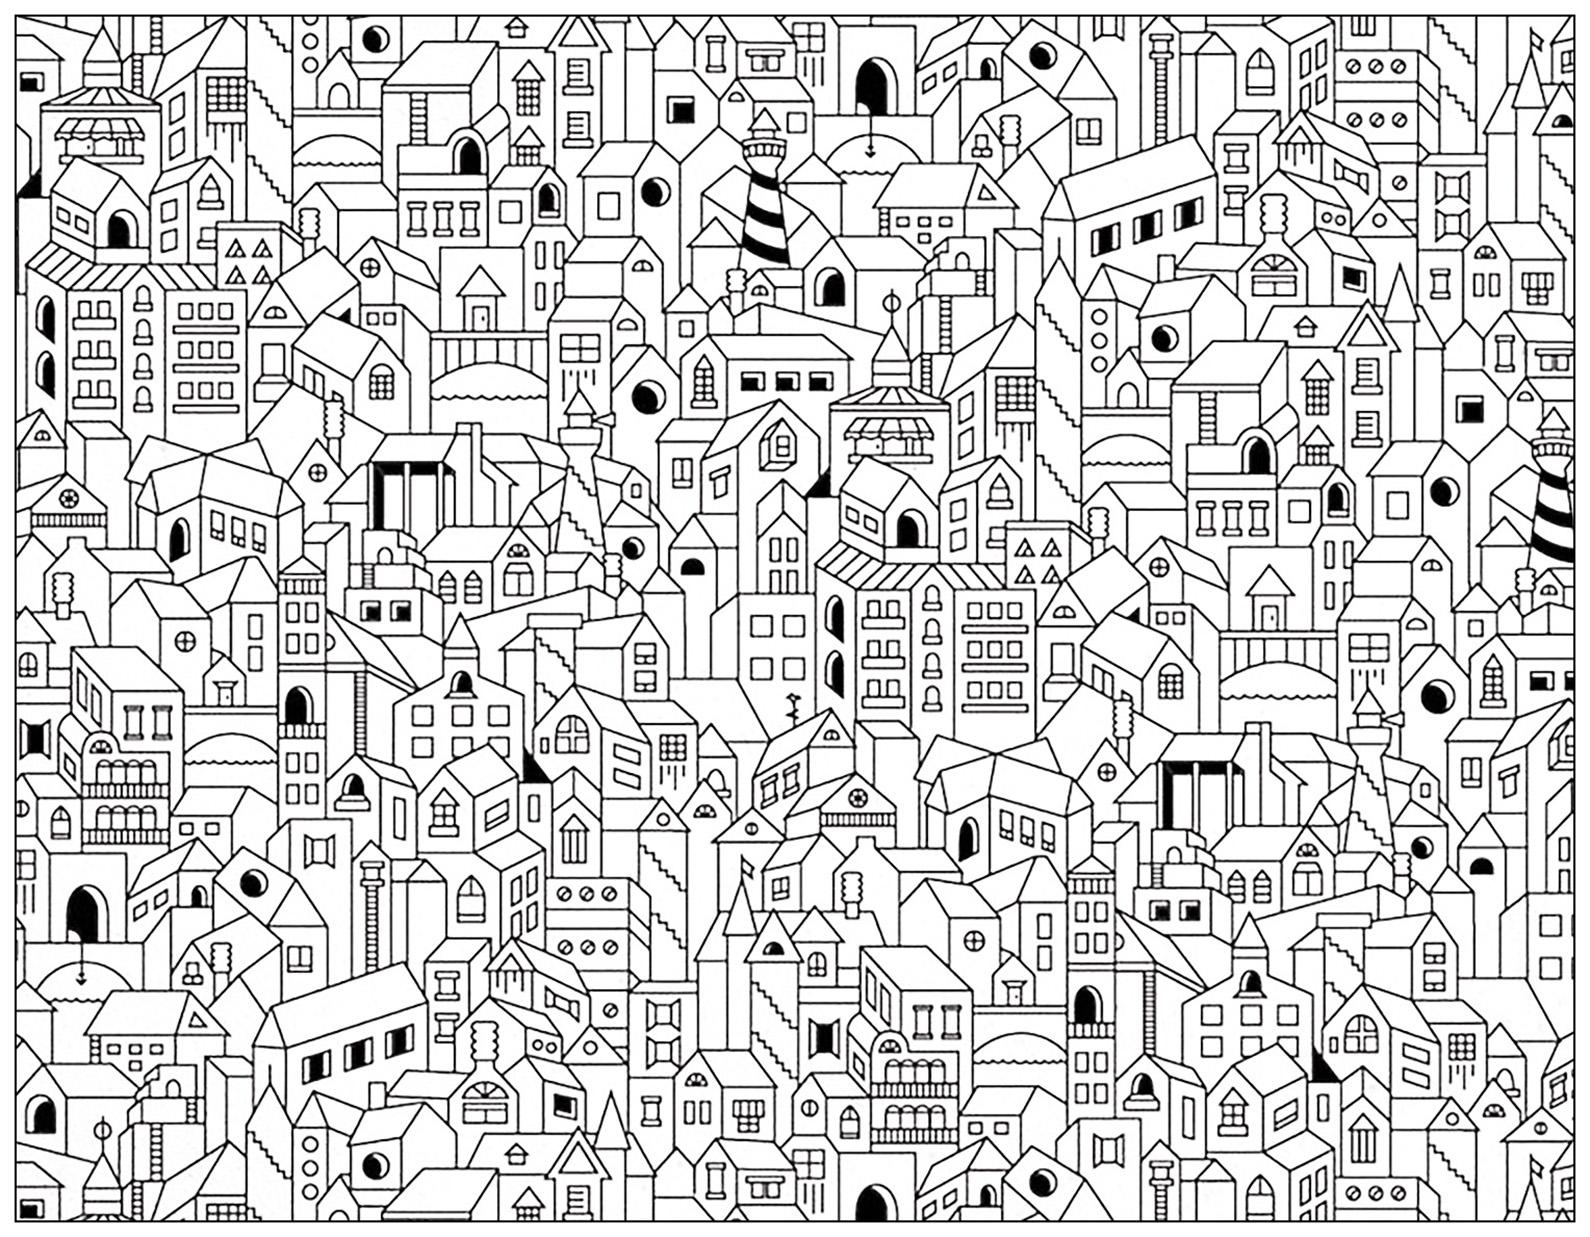 Doodle city buildings doodle art doodling adult coloring pages page 3